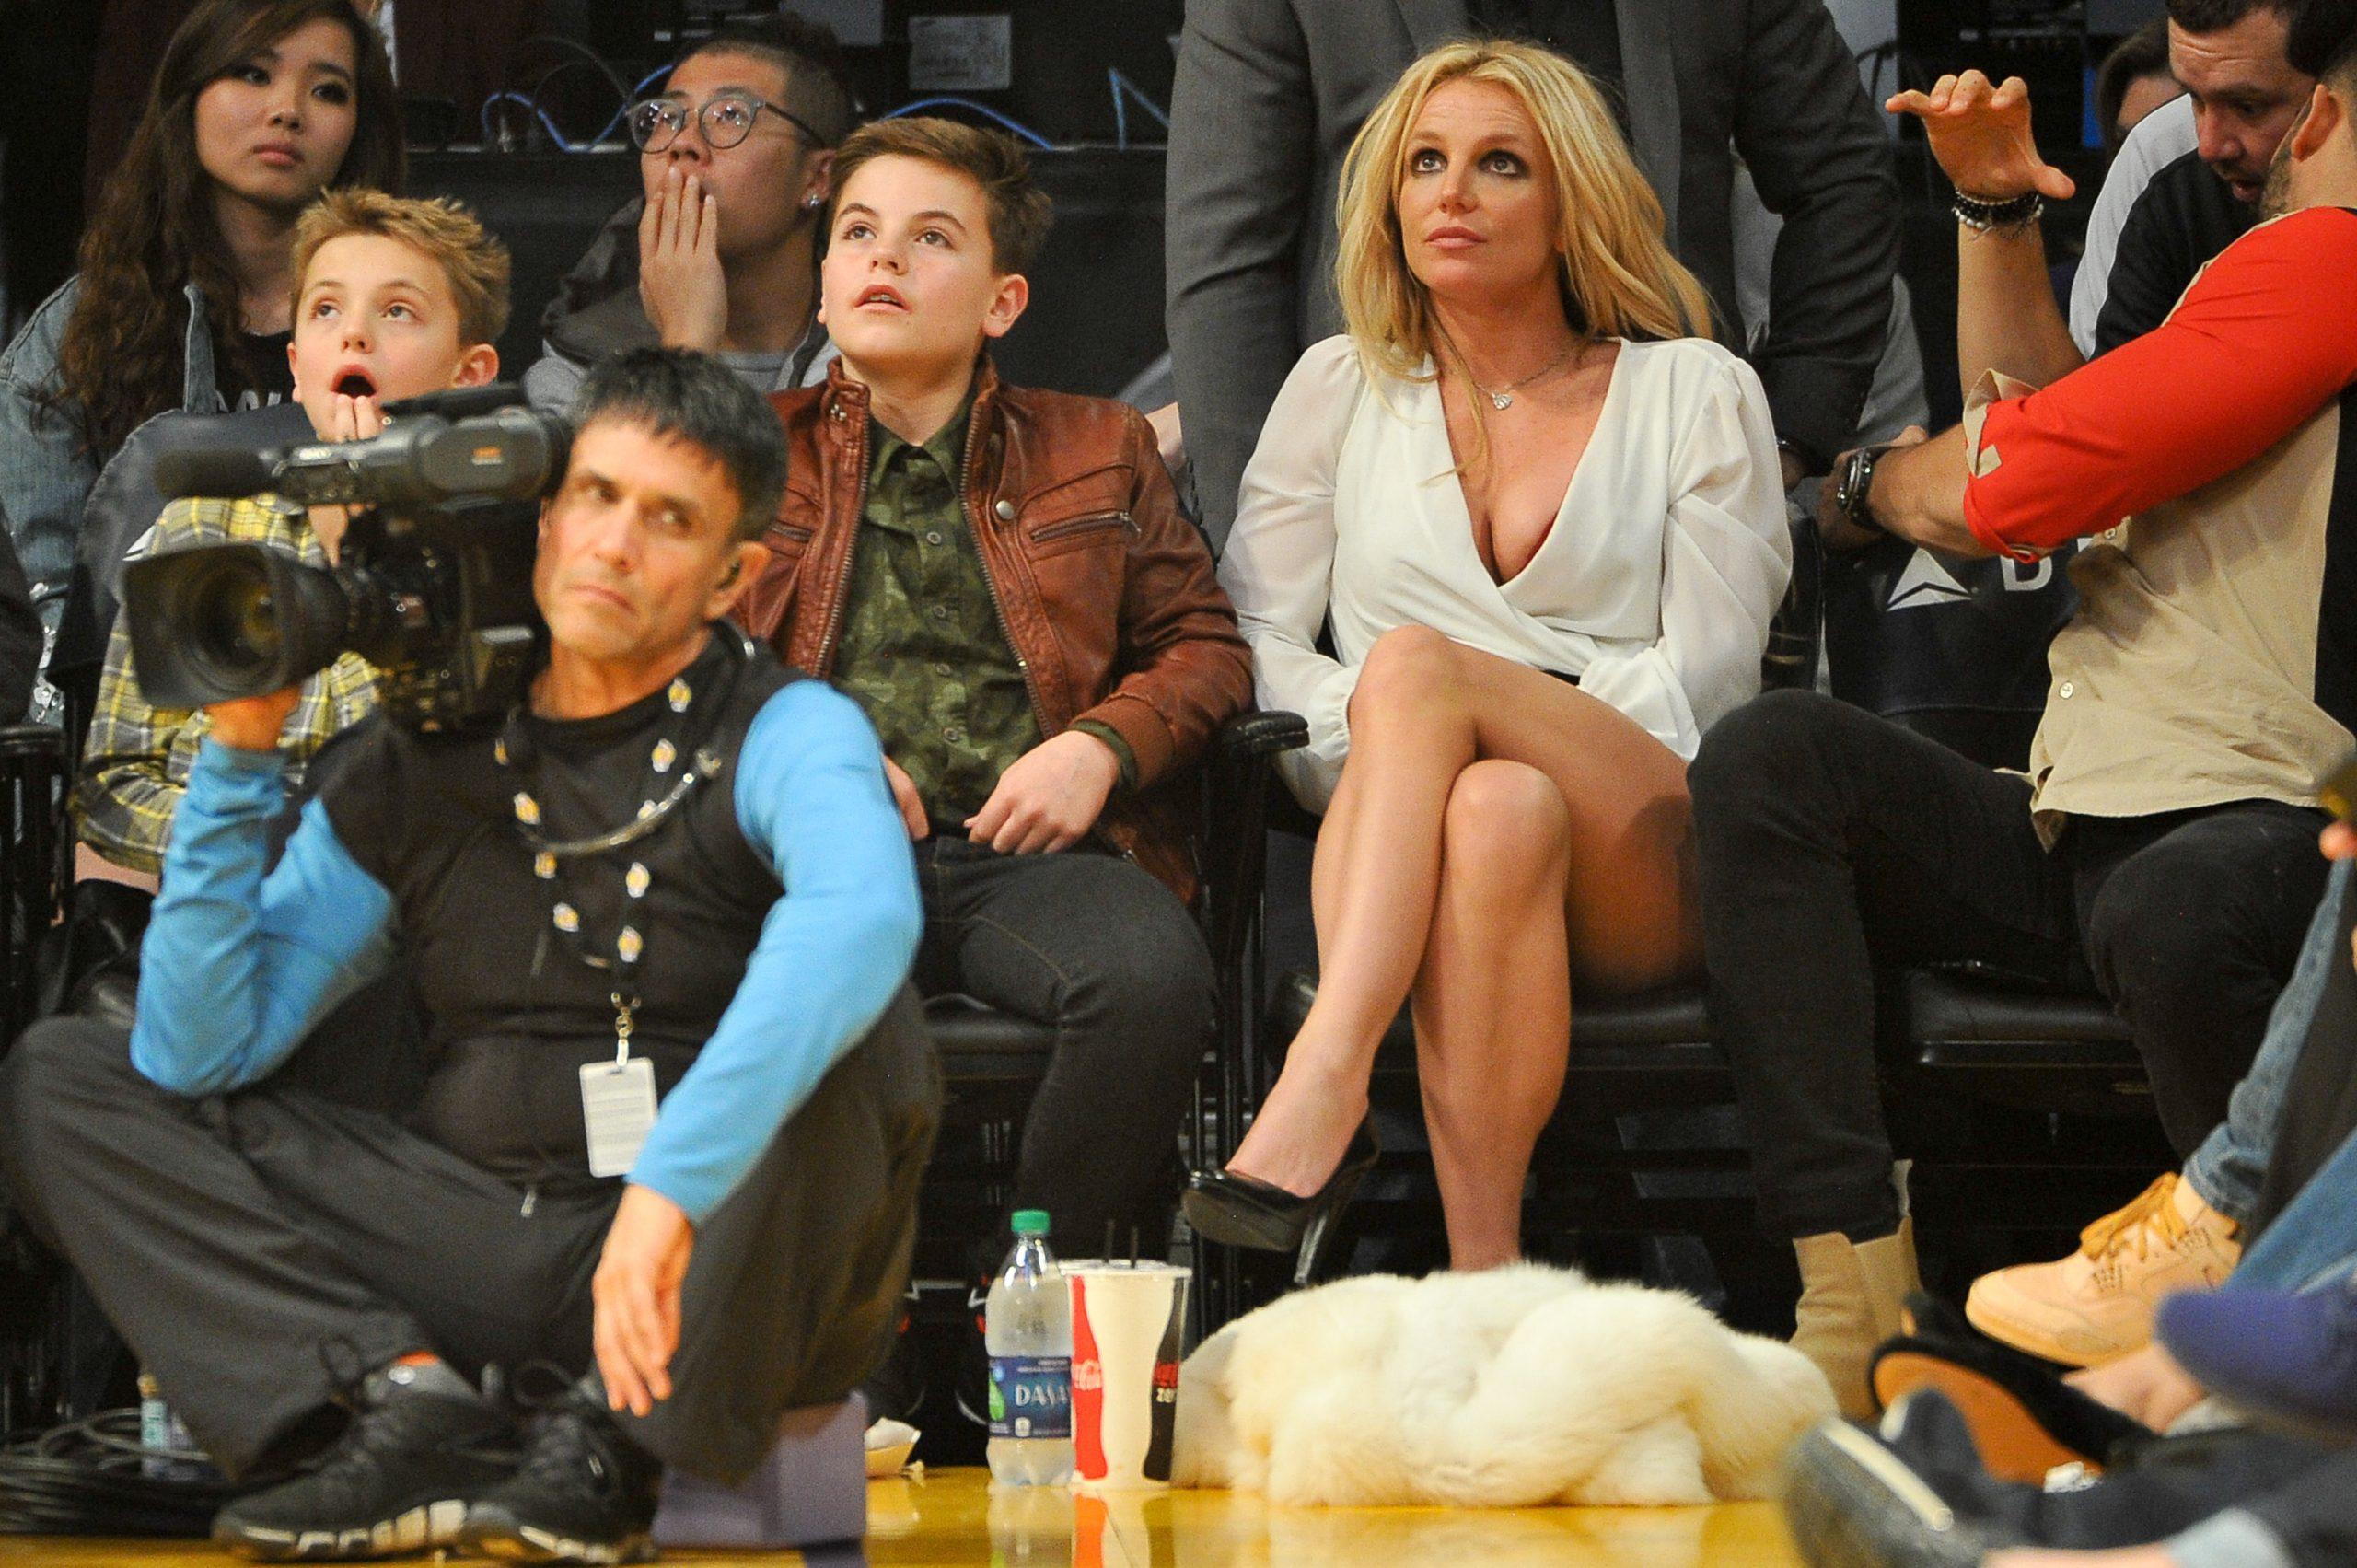 Britney Spears with her two sons Sean Preston and Jayden James Federline